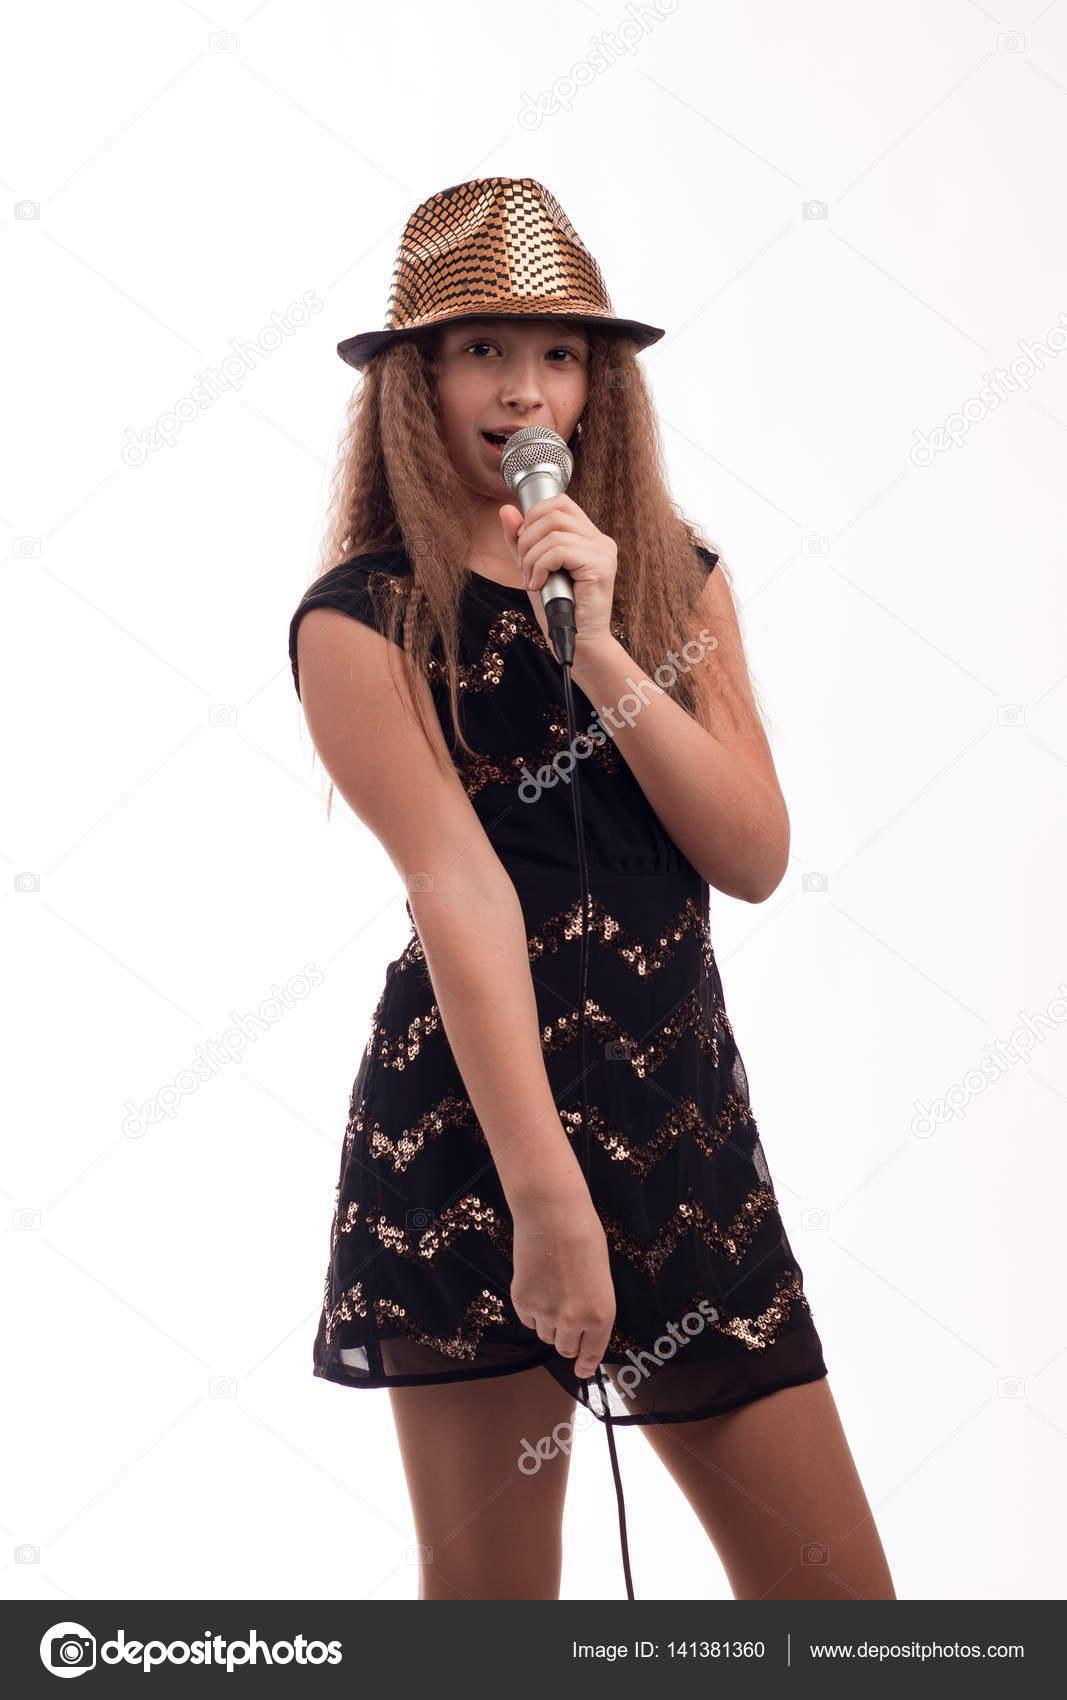 Cancion mujer alta fria vestida de negro